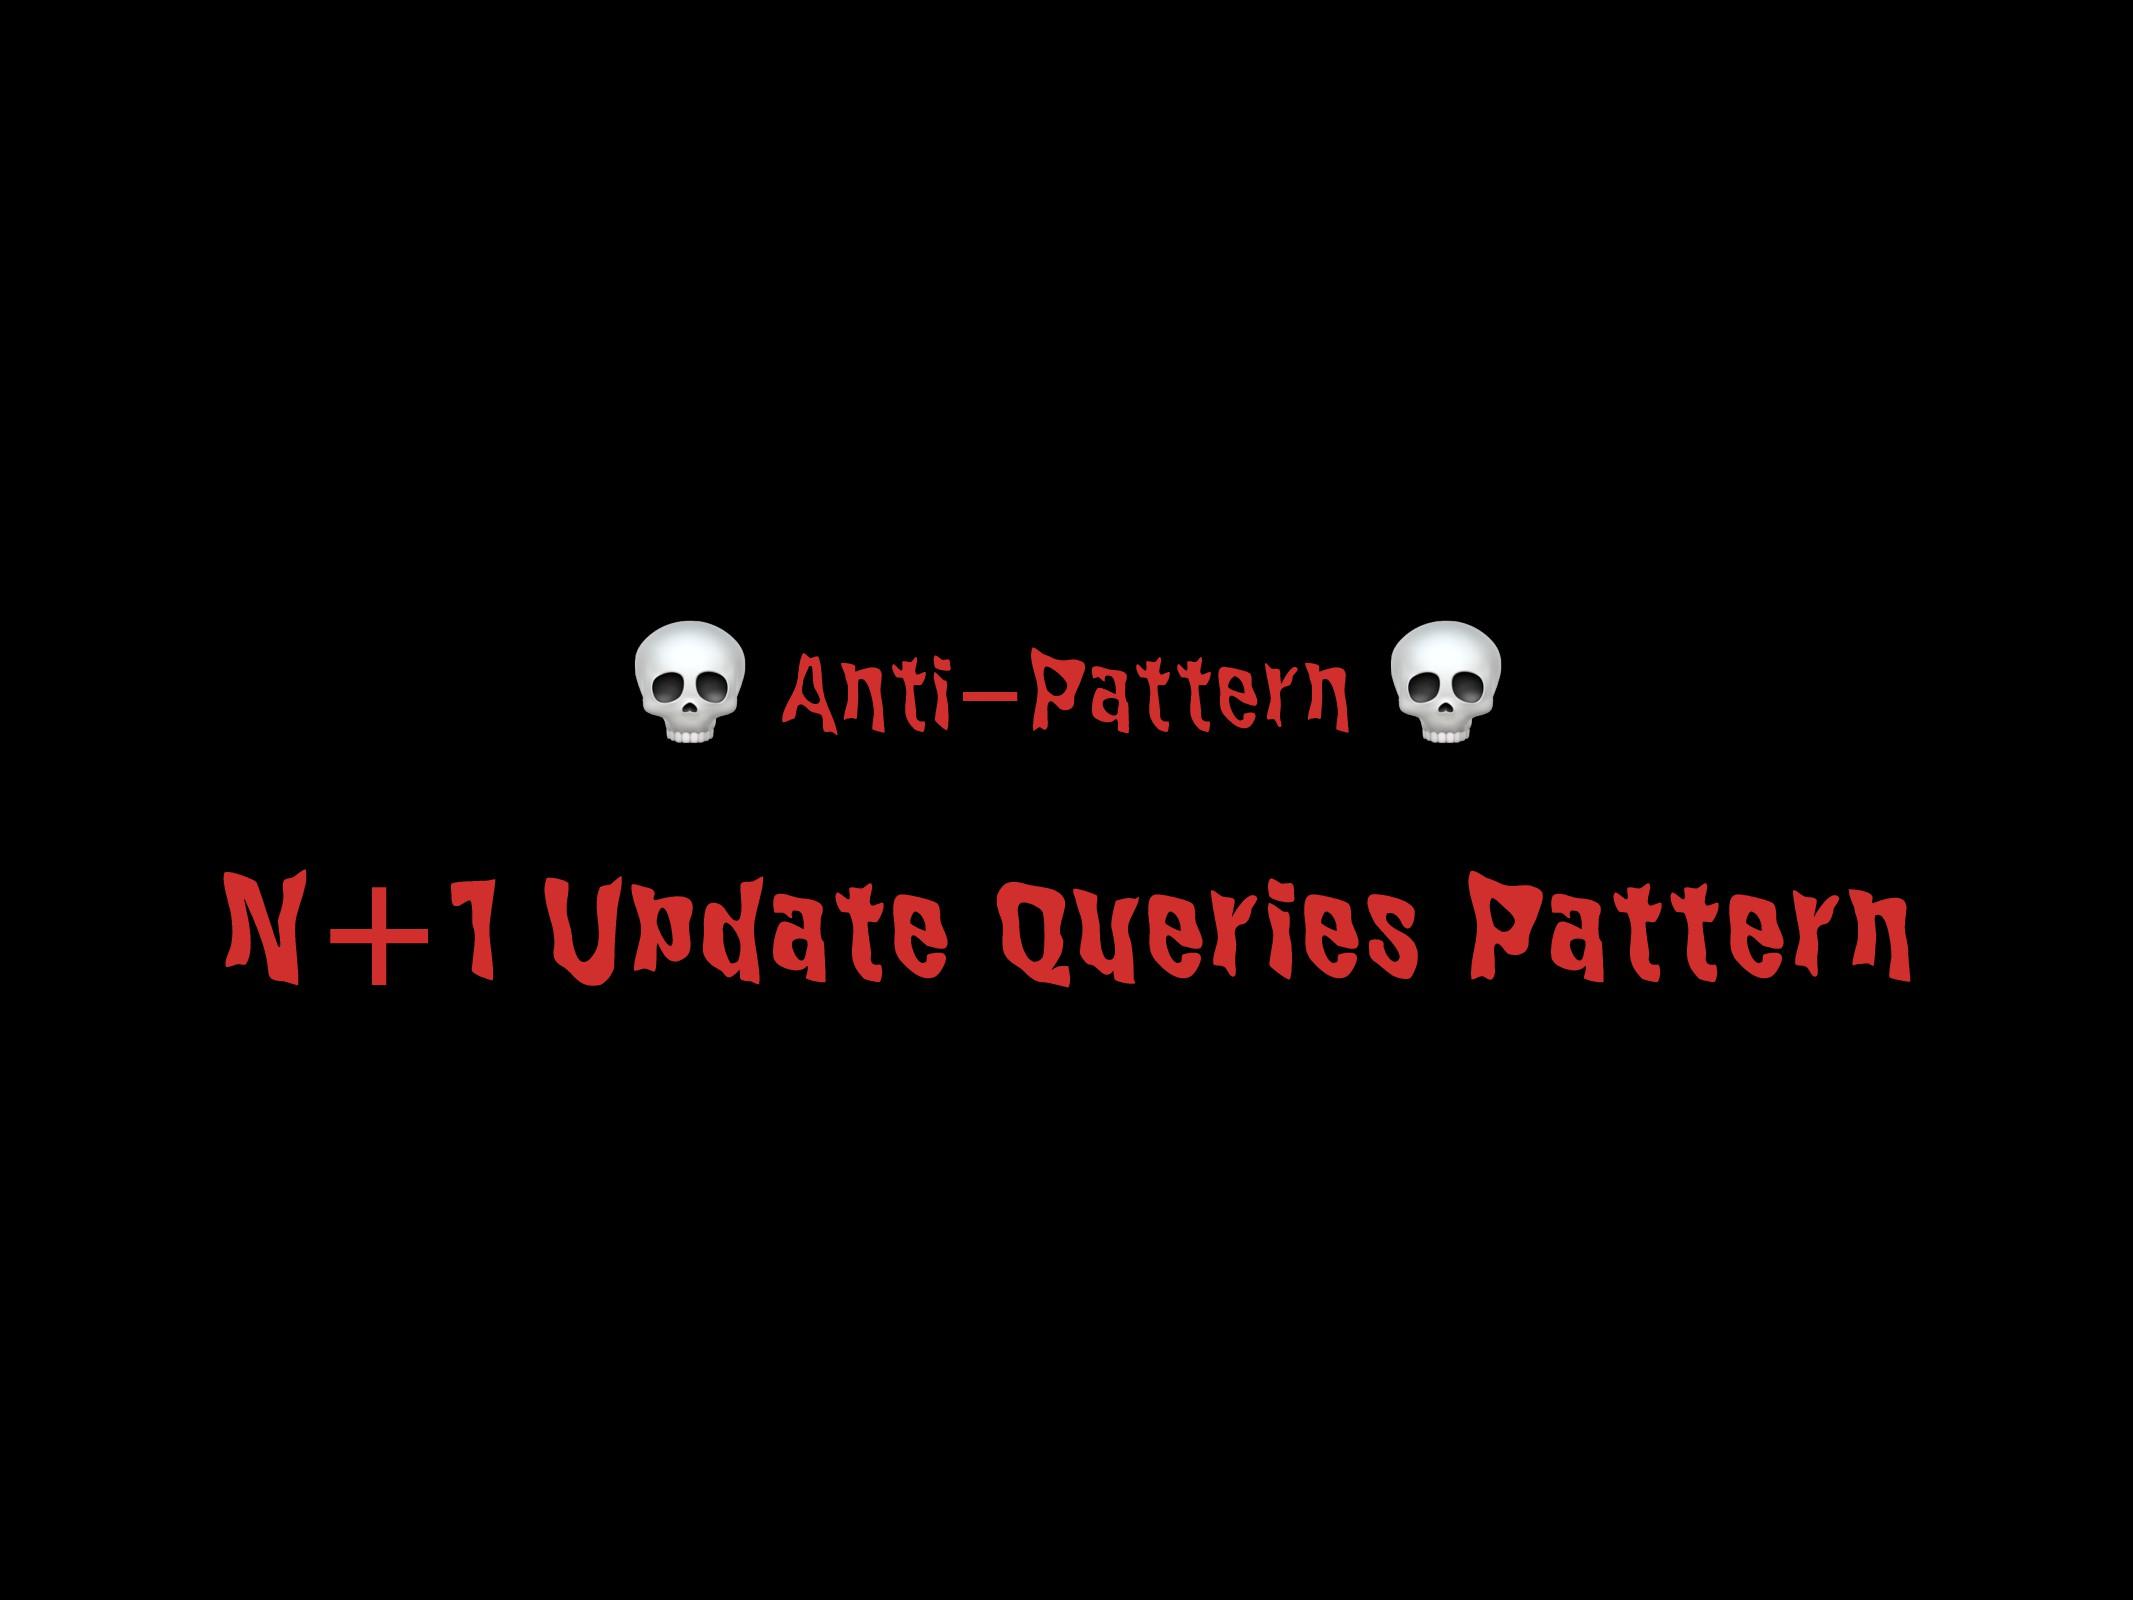 N+1 Update Queries Pattern 20  Anti-Pattern